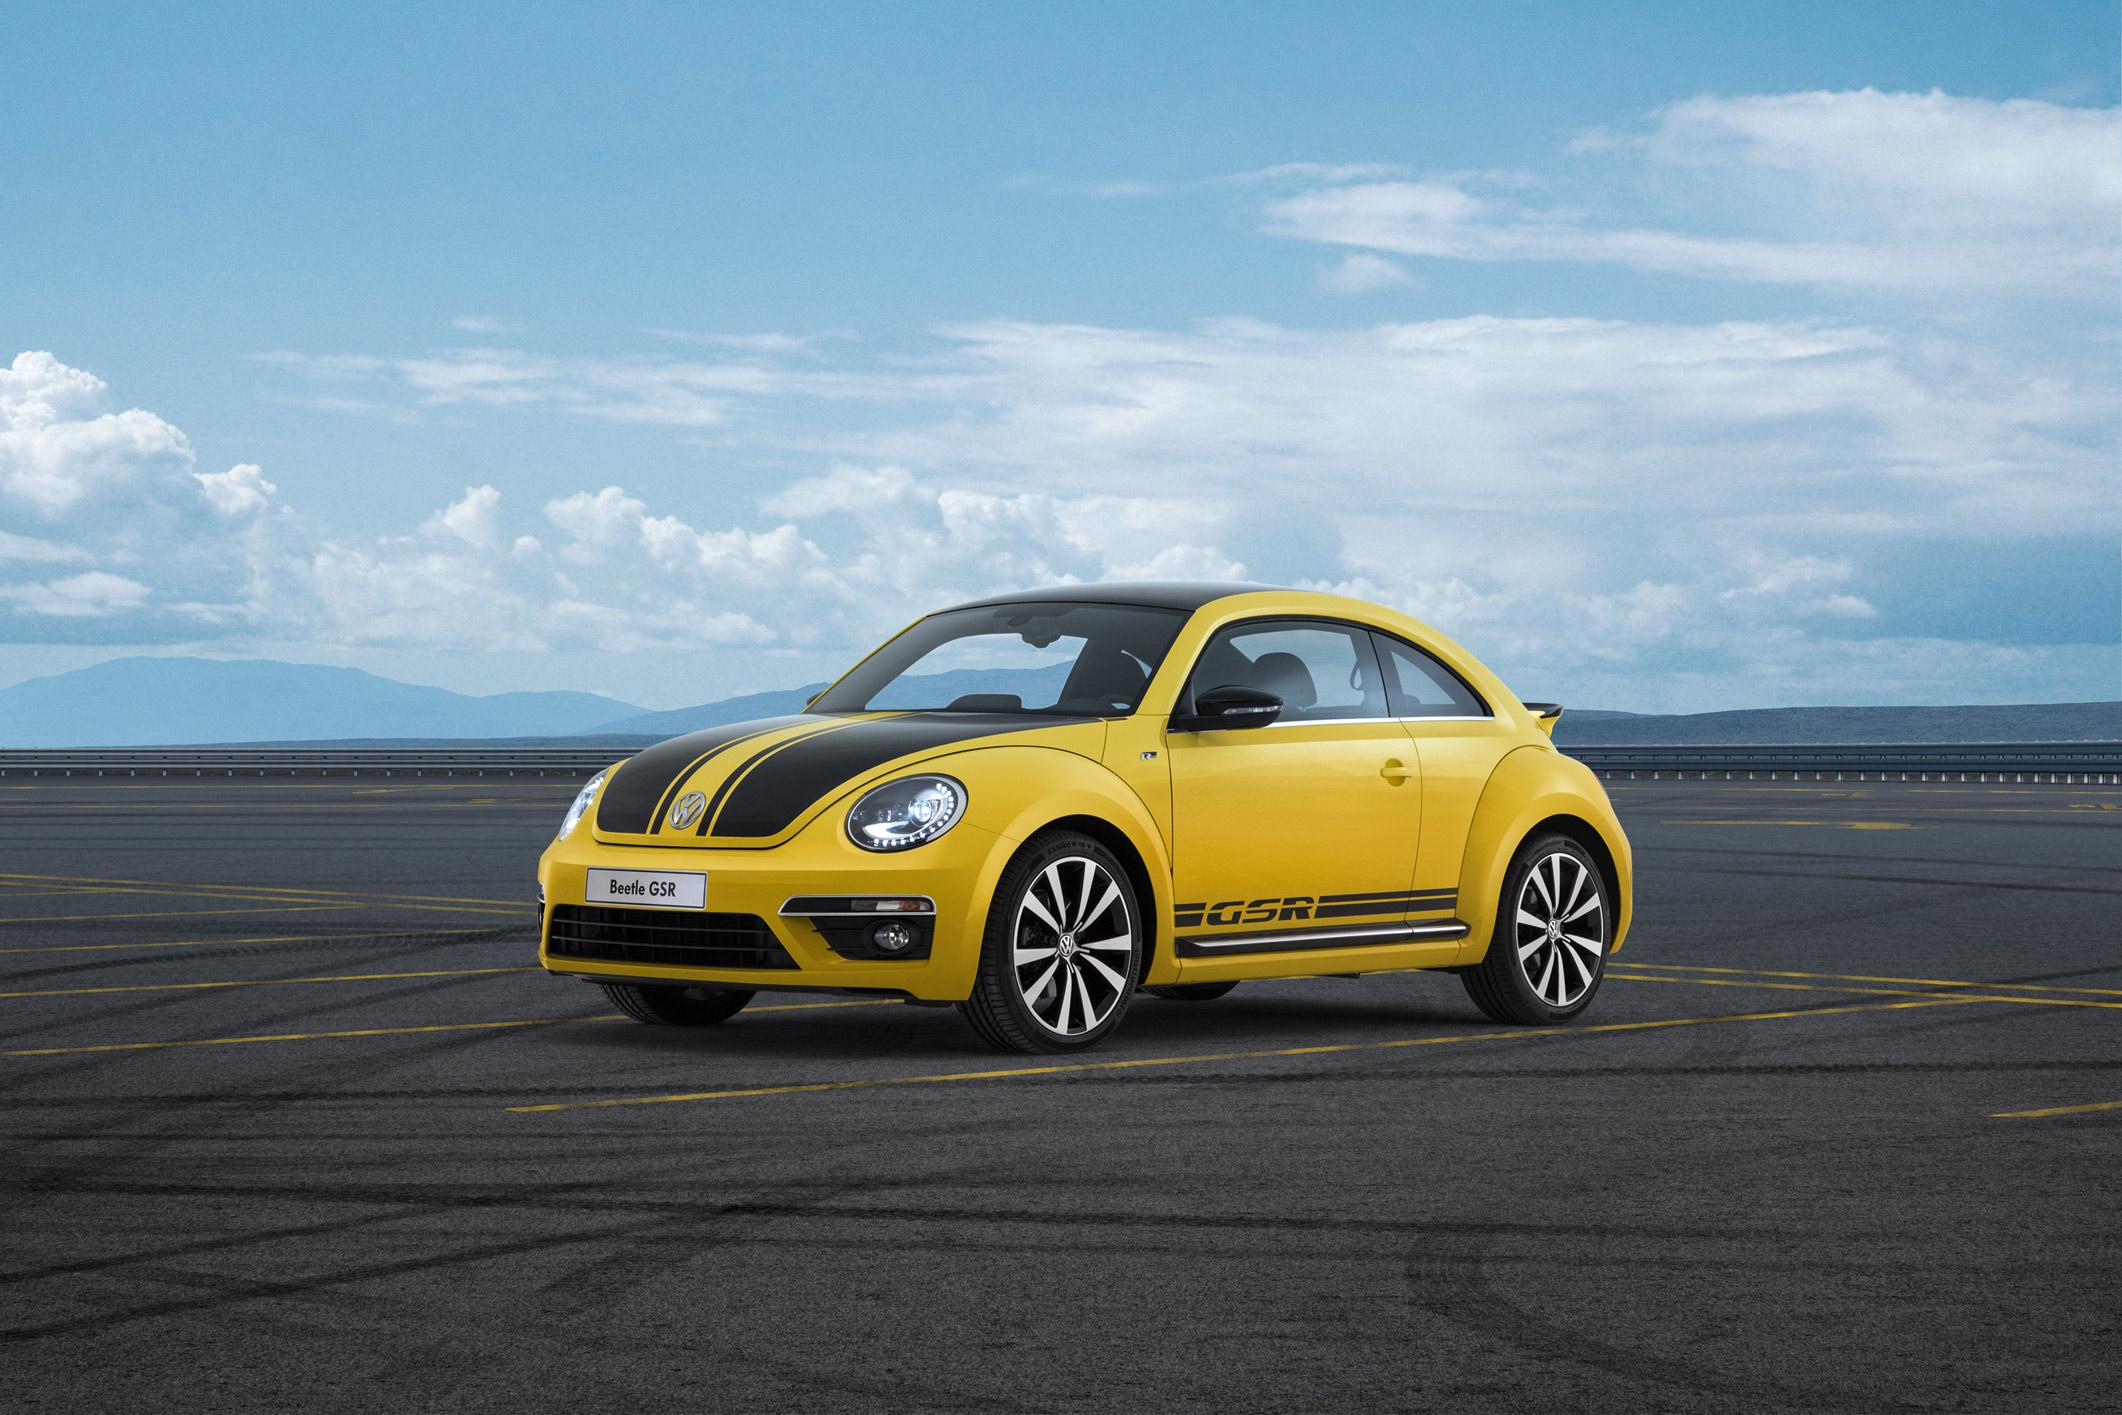 vw-beetle-gsr1